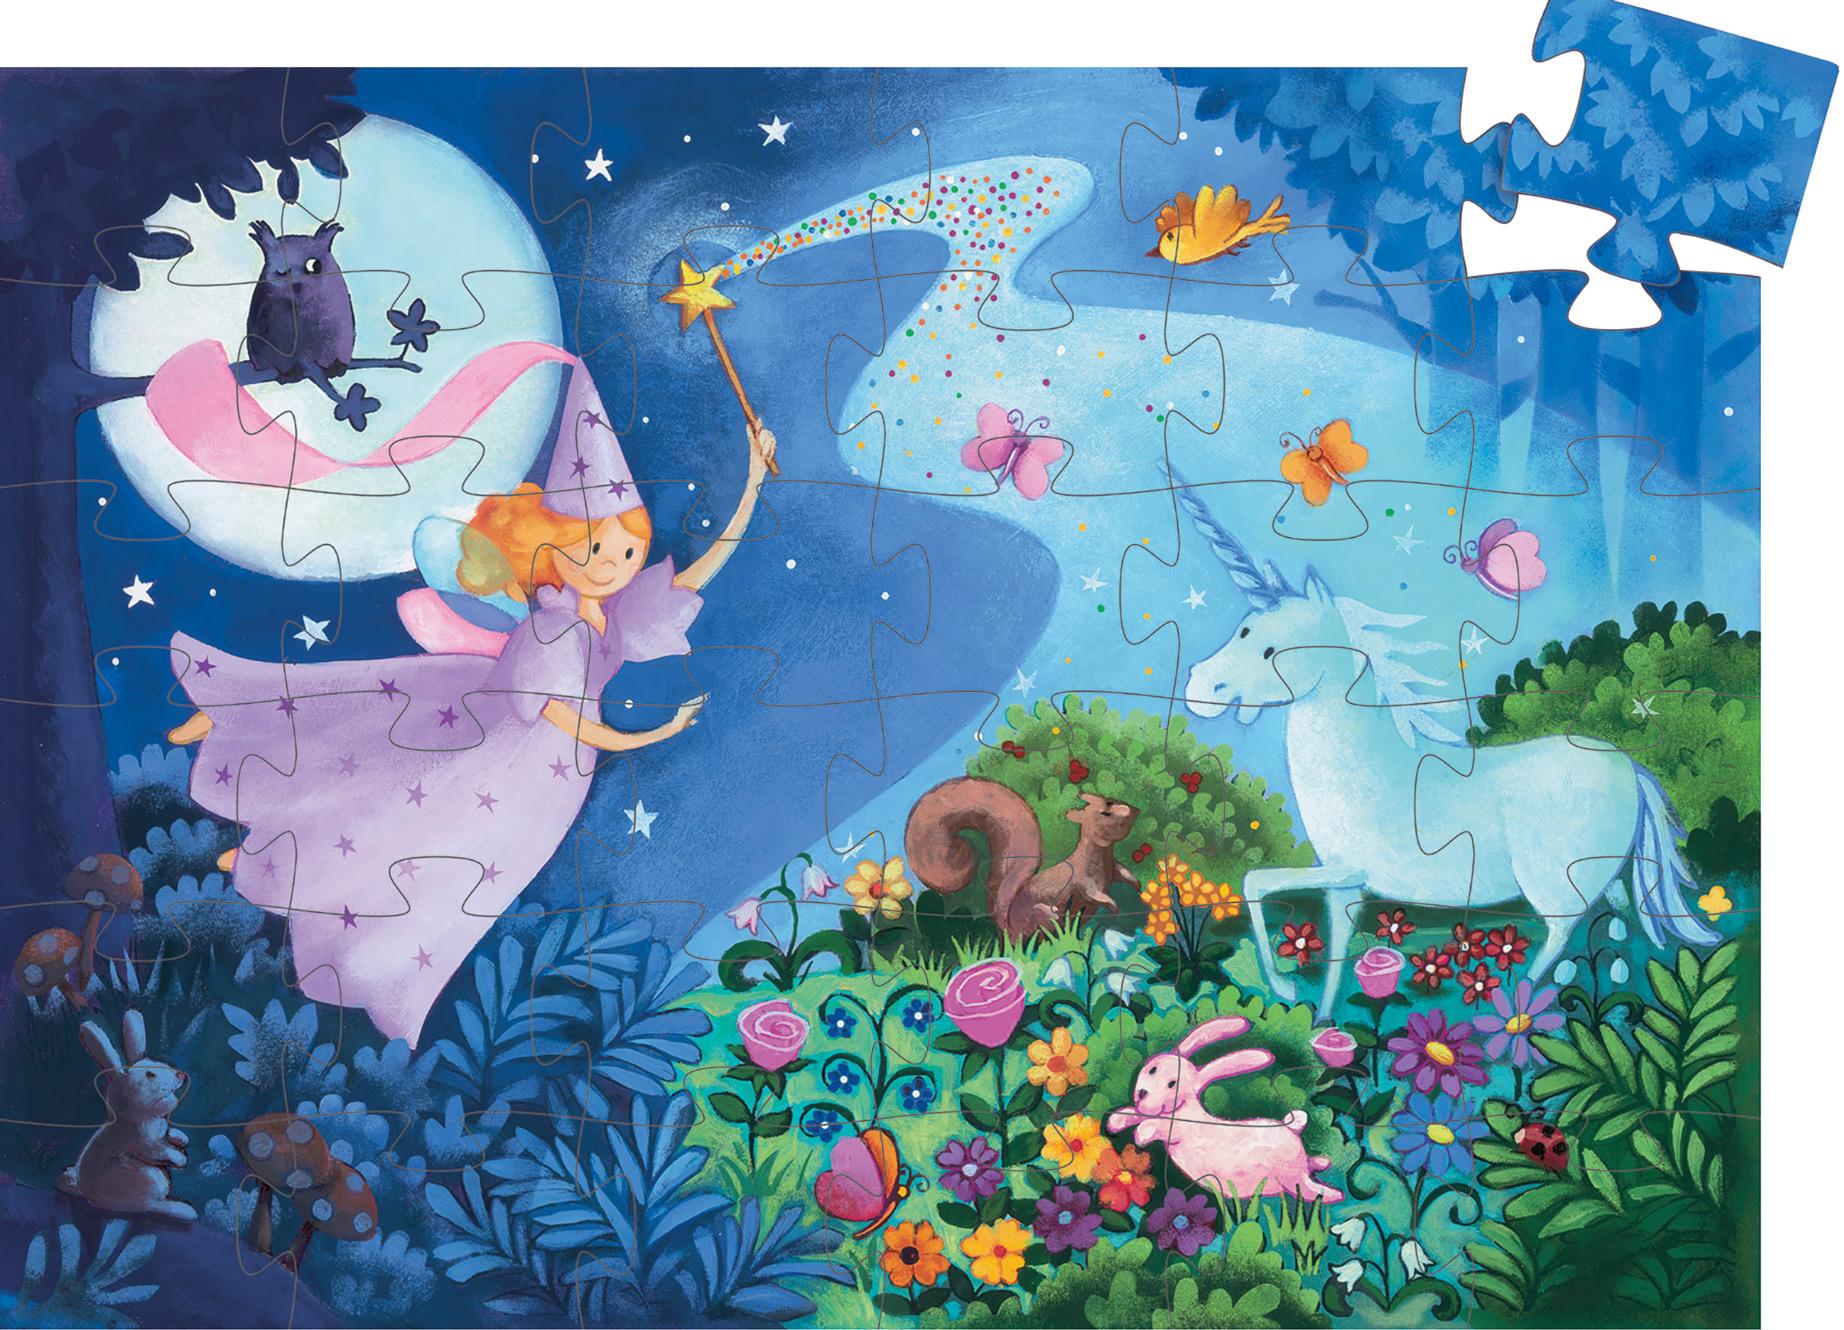 The Fairy And The Unicorn Fairies Jigsaw Puzzle